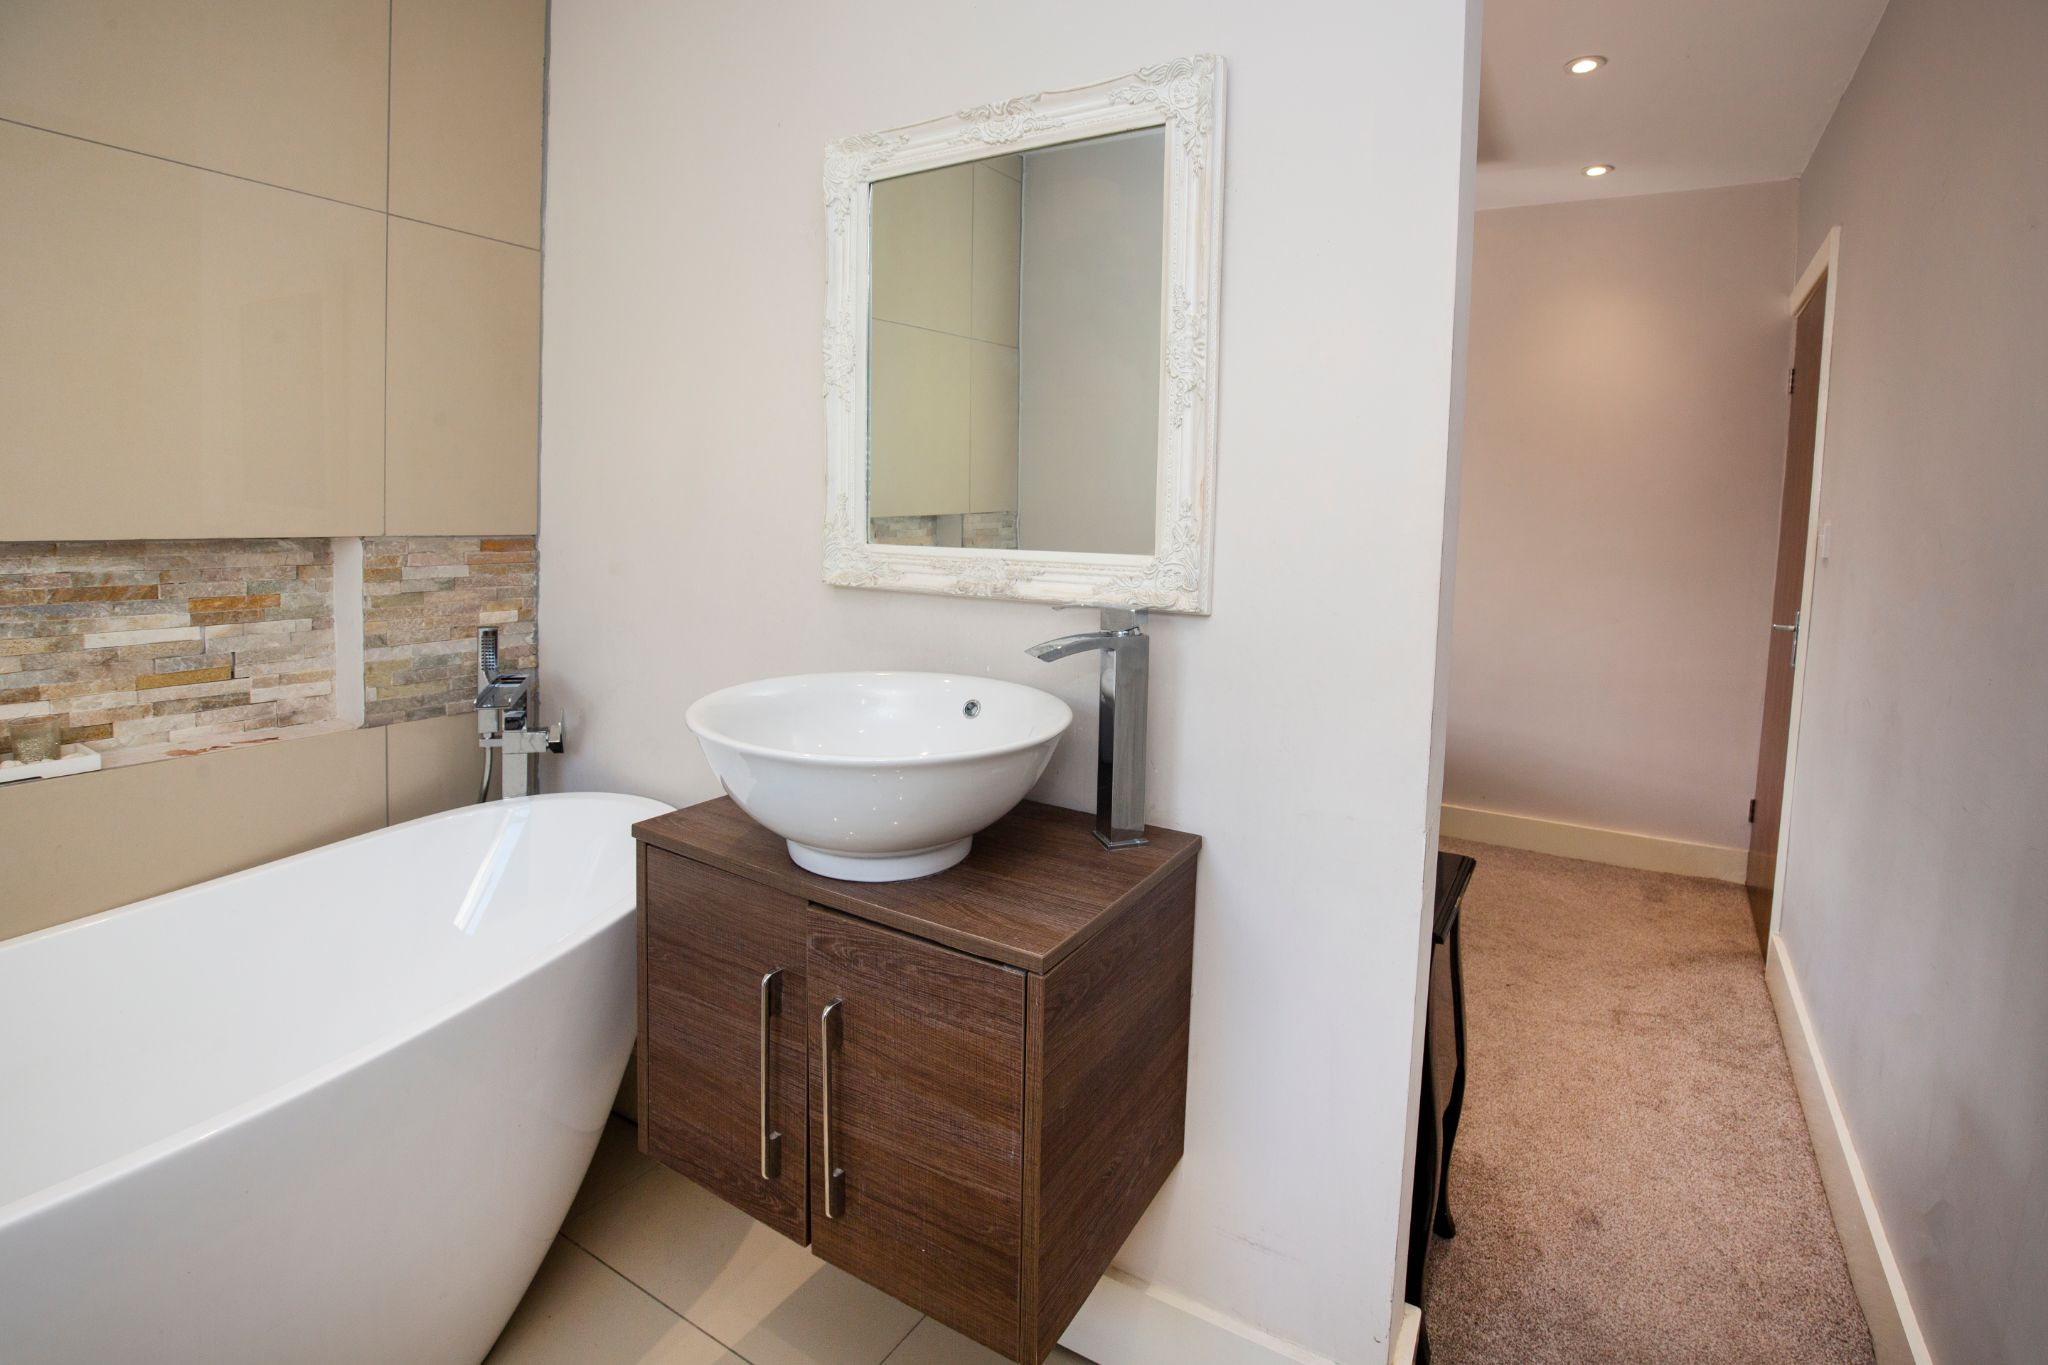 4 bedroom detached house For Sale in Brighouse - En-suite bathroom